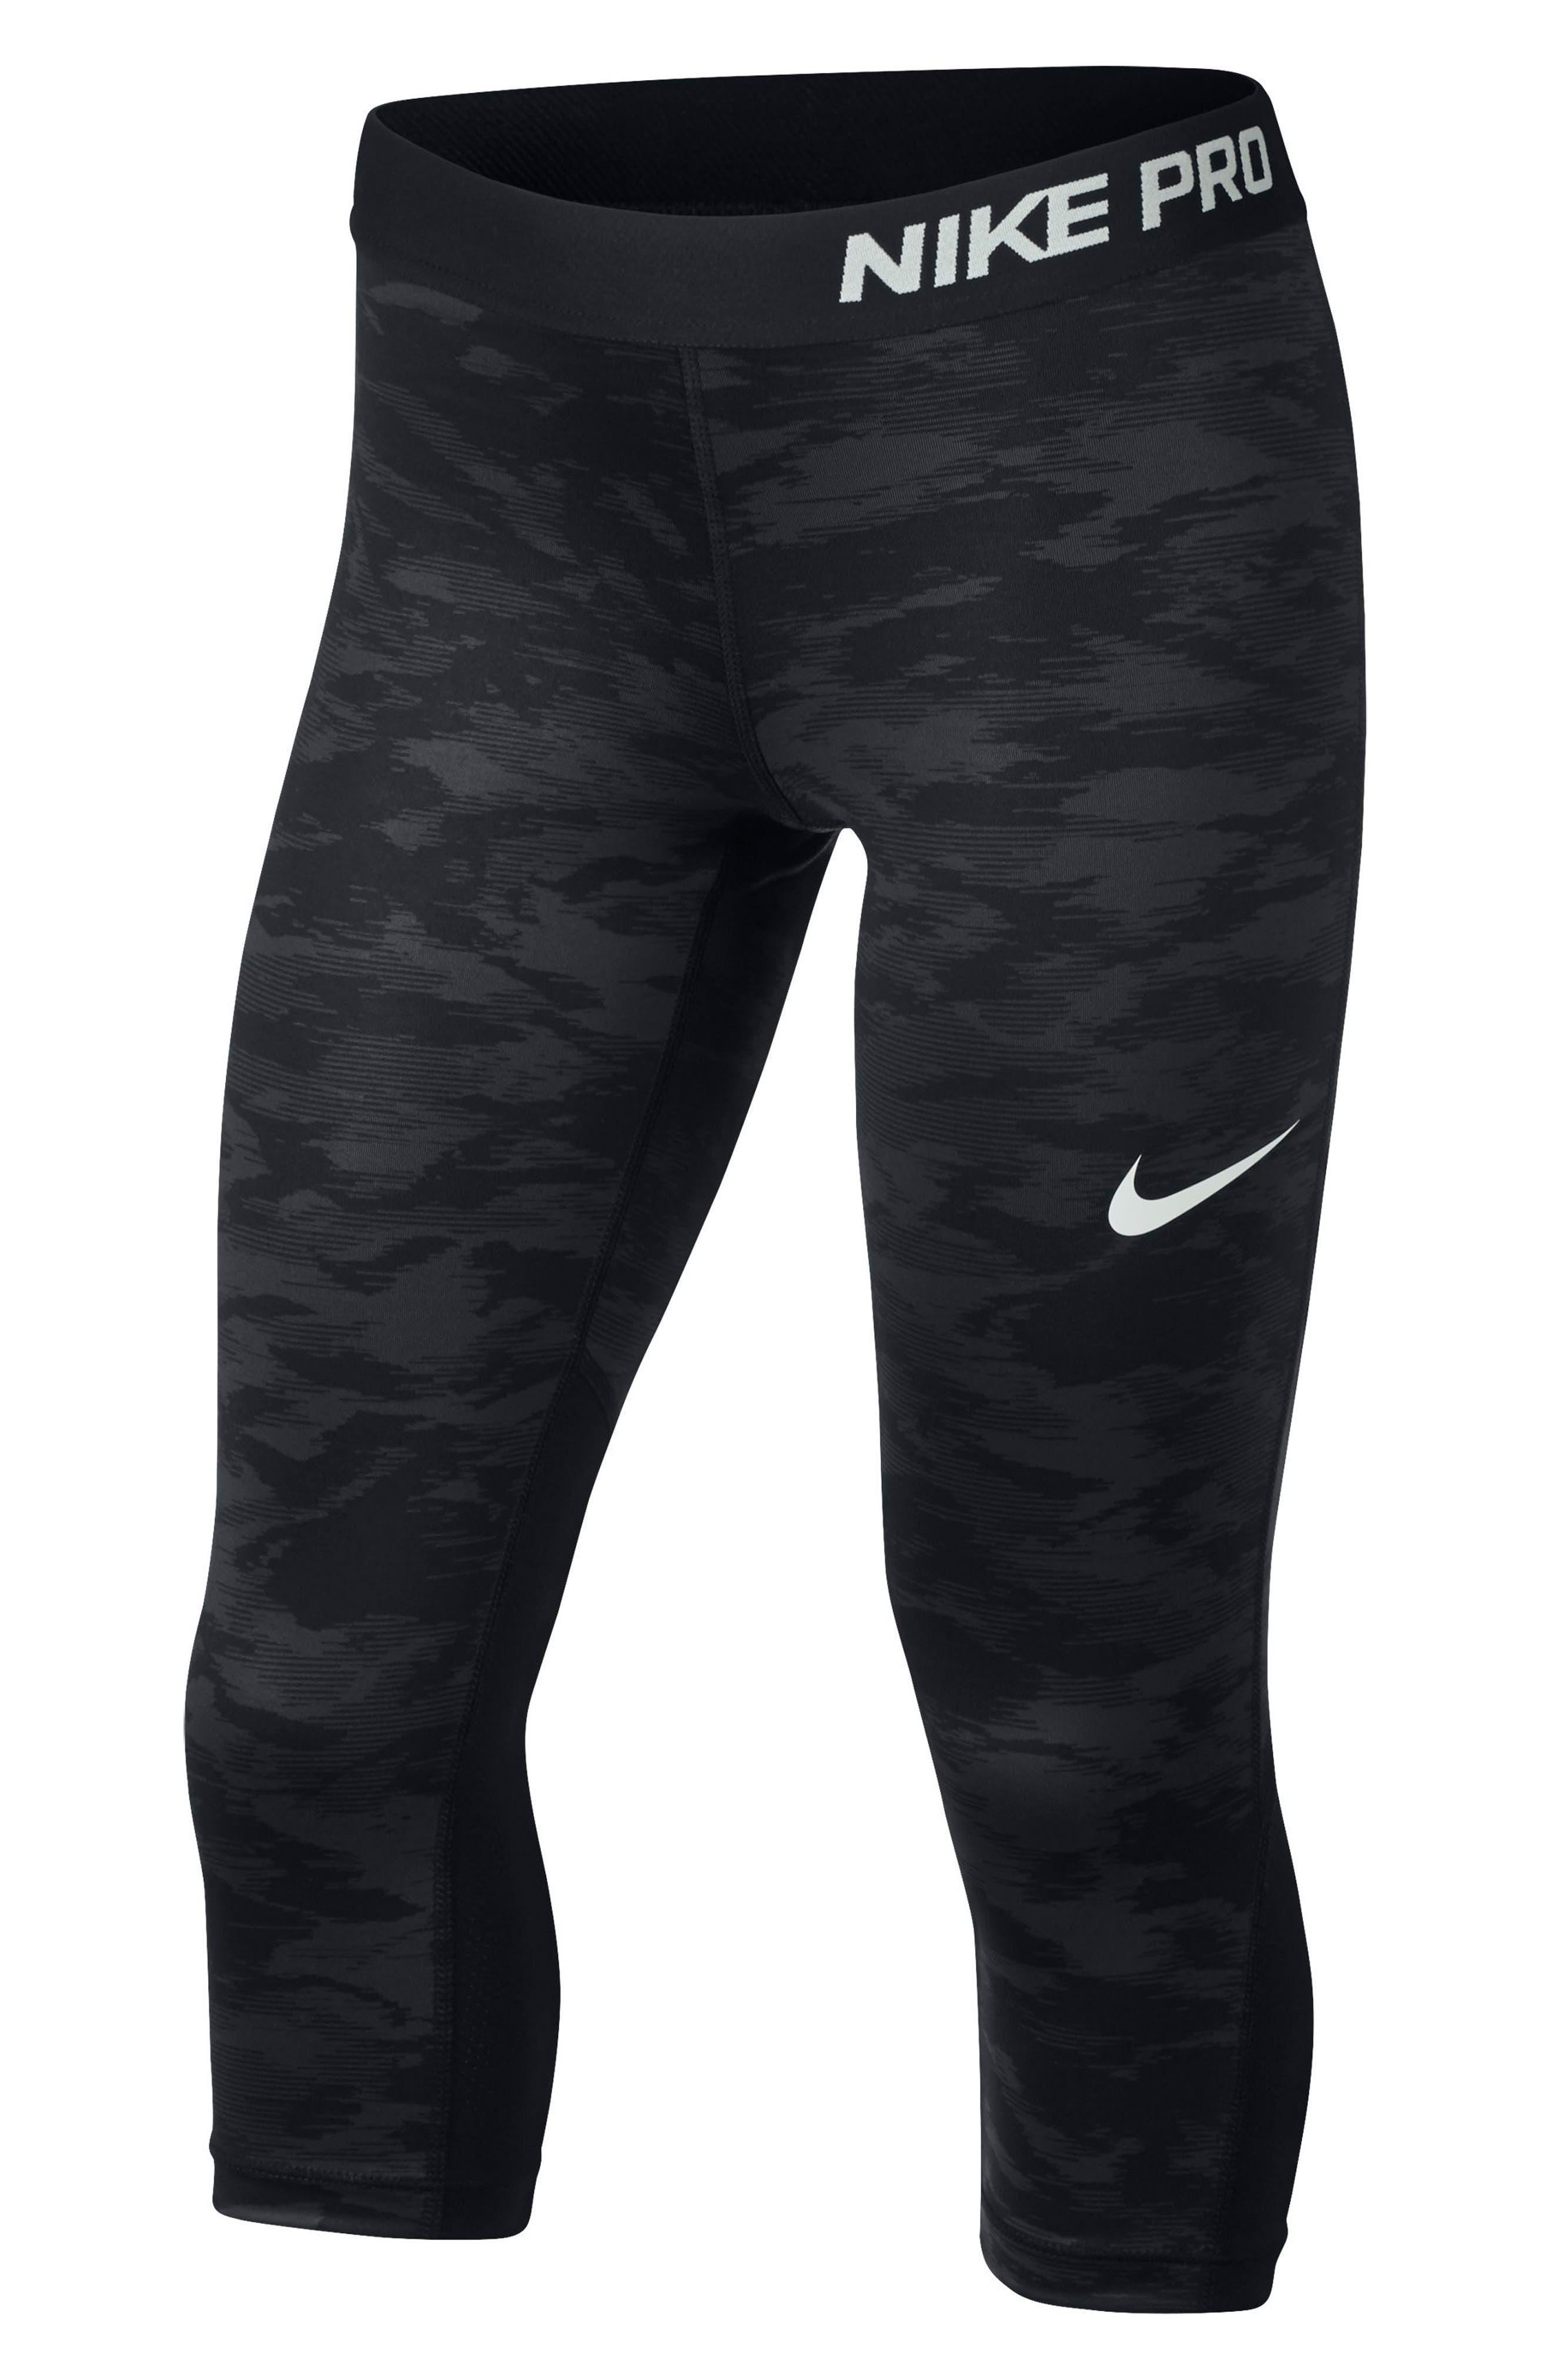 Alternate Image 1 Selected - Nike Pro Cool Crop Leggings (Big Girls)